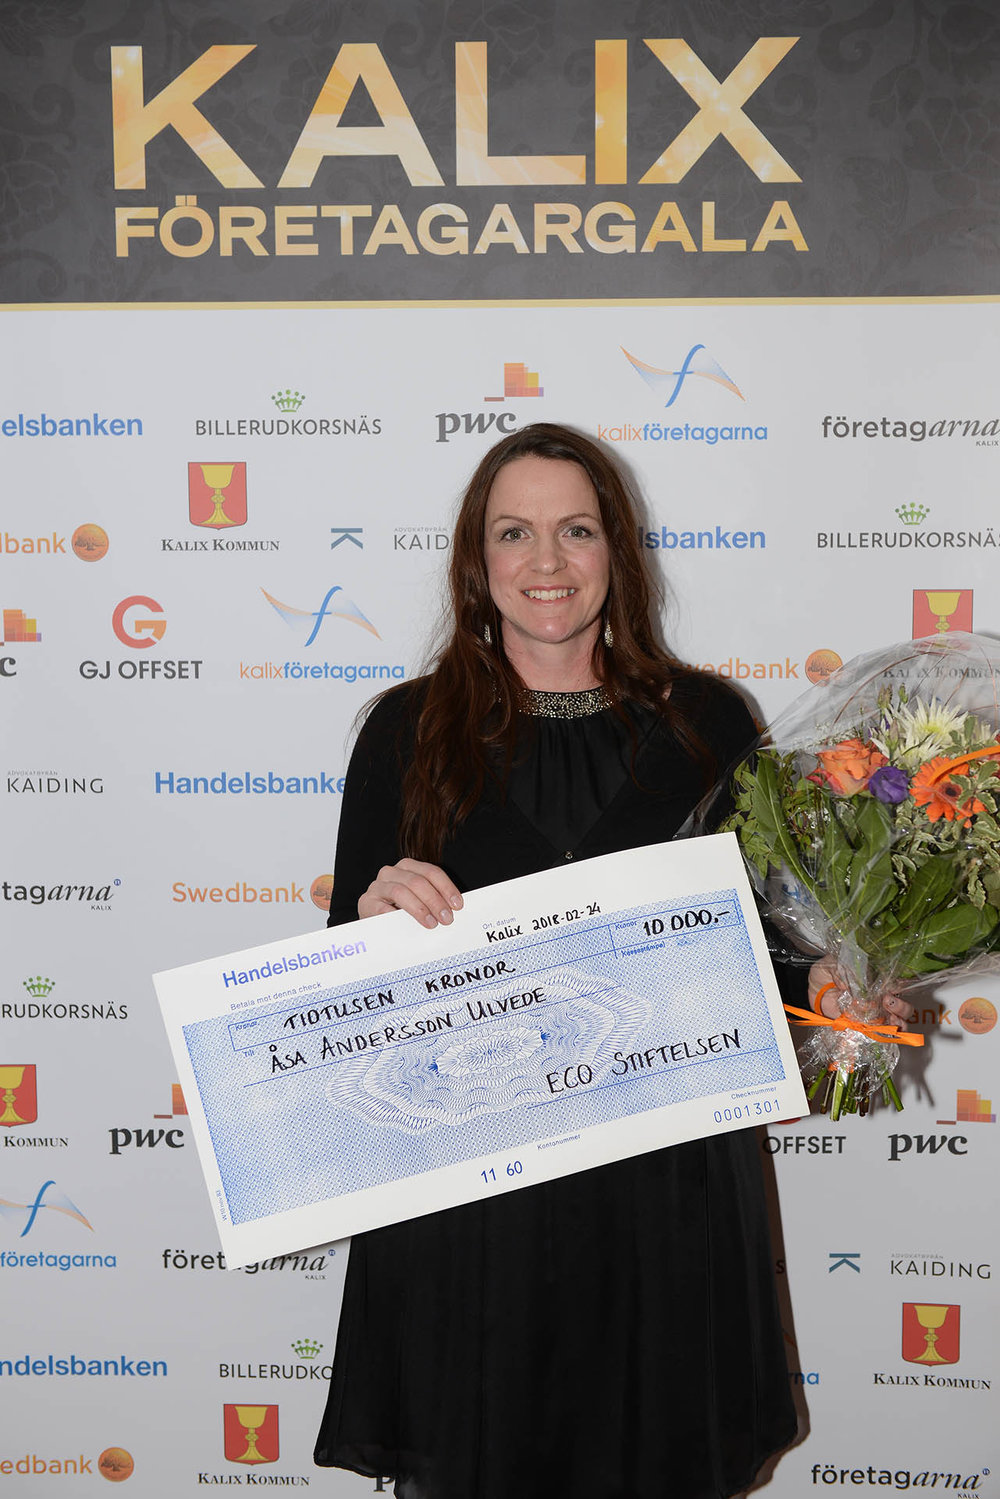 Stipendium Elisabeth och Carlo Olsens stiftelse - Åsa Andersson-Ulvede, Arctic Treats